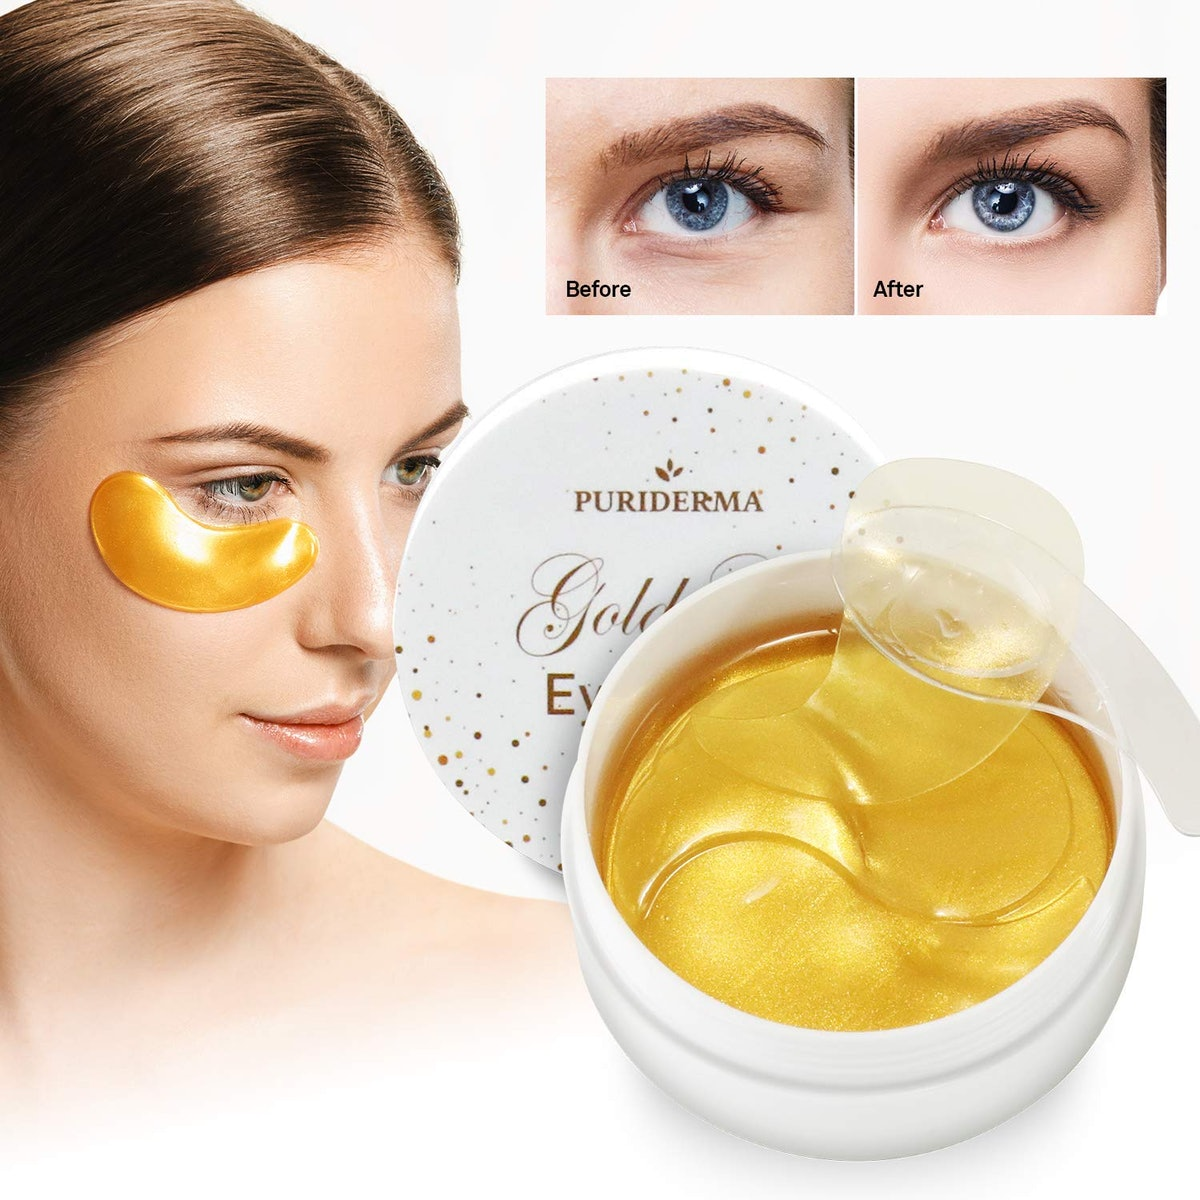 Puriderma Gold Gel Eye Masks